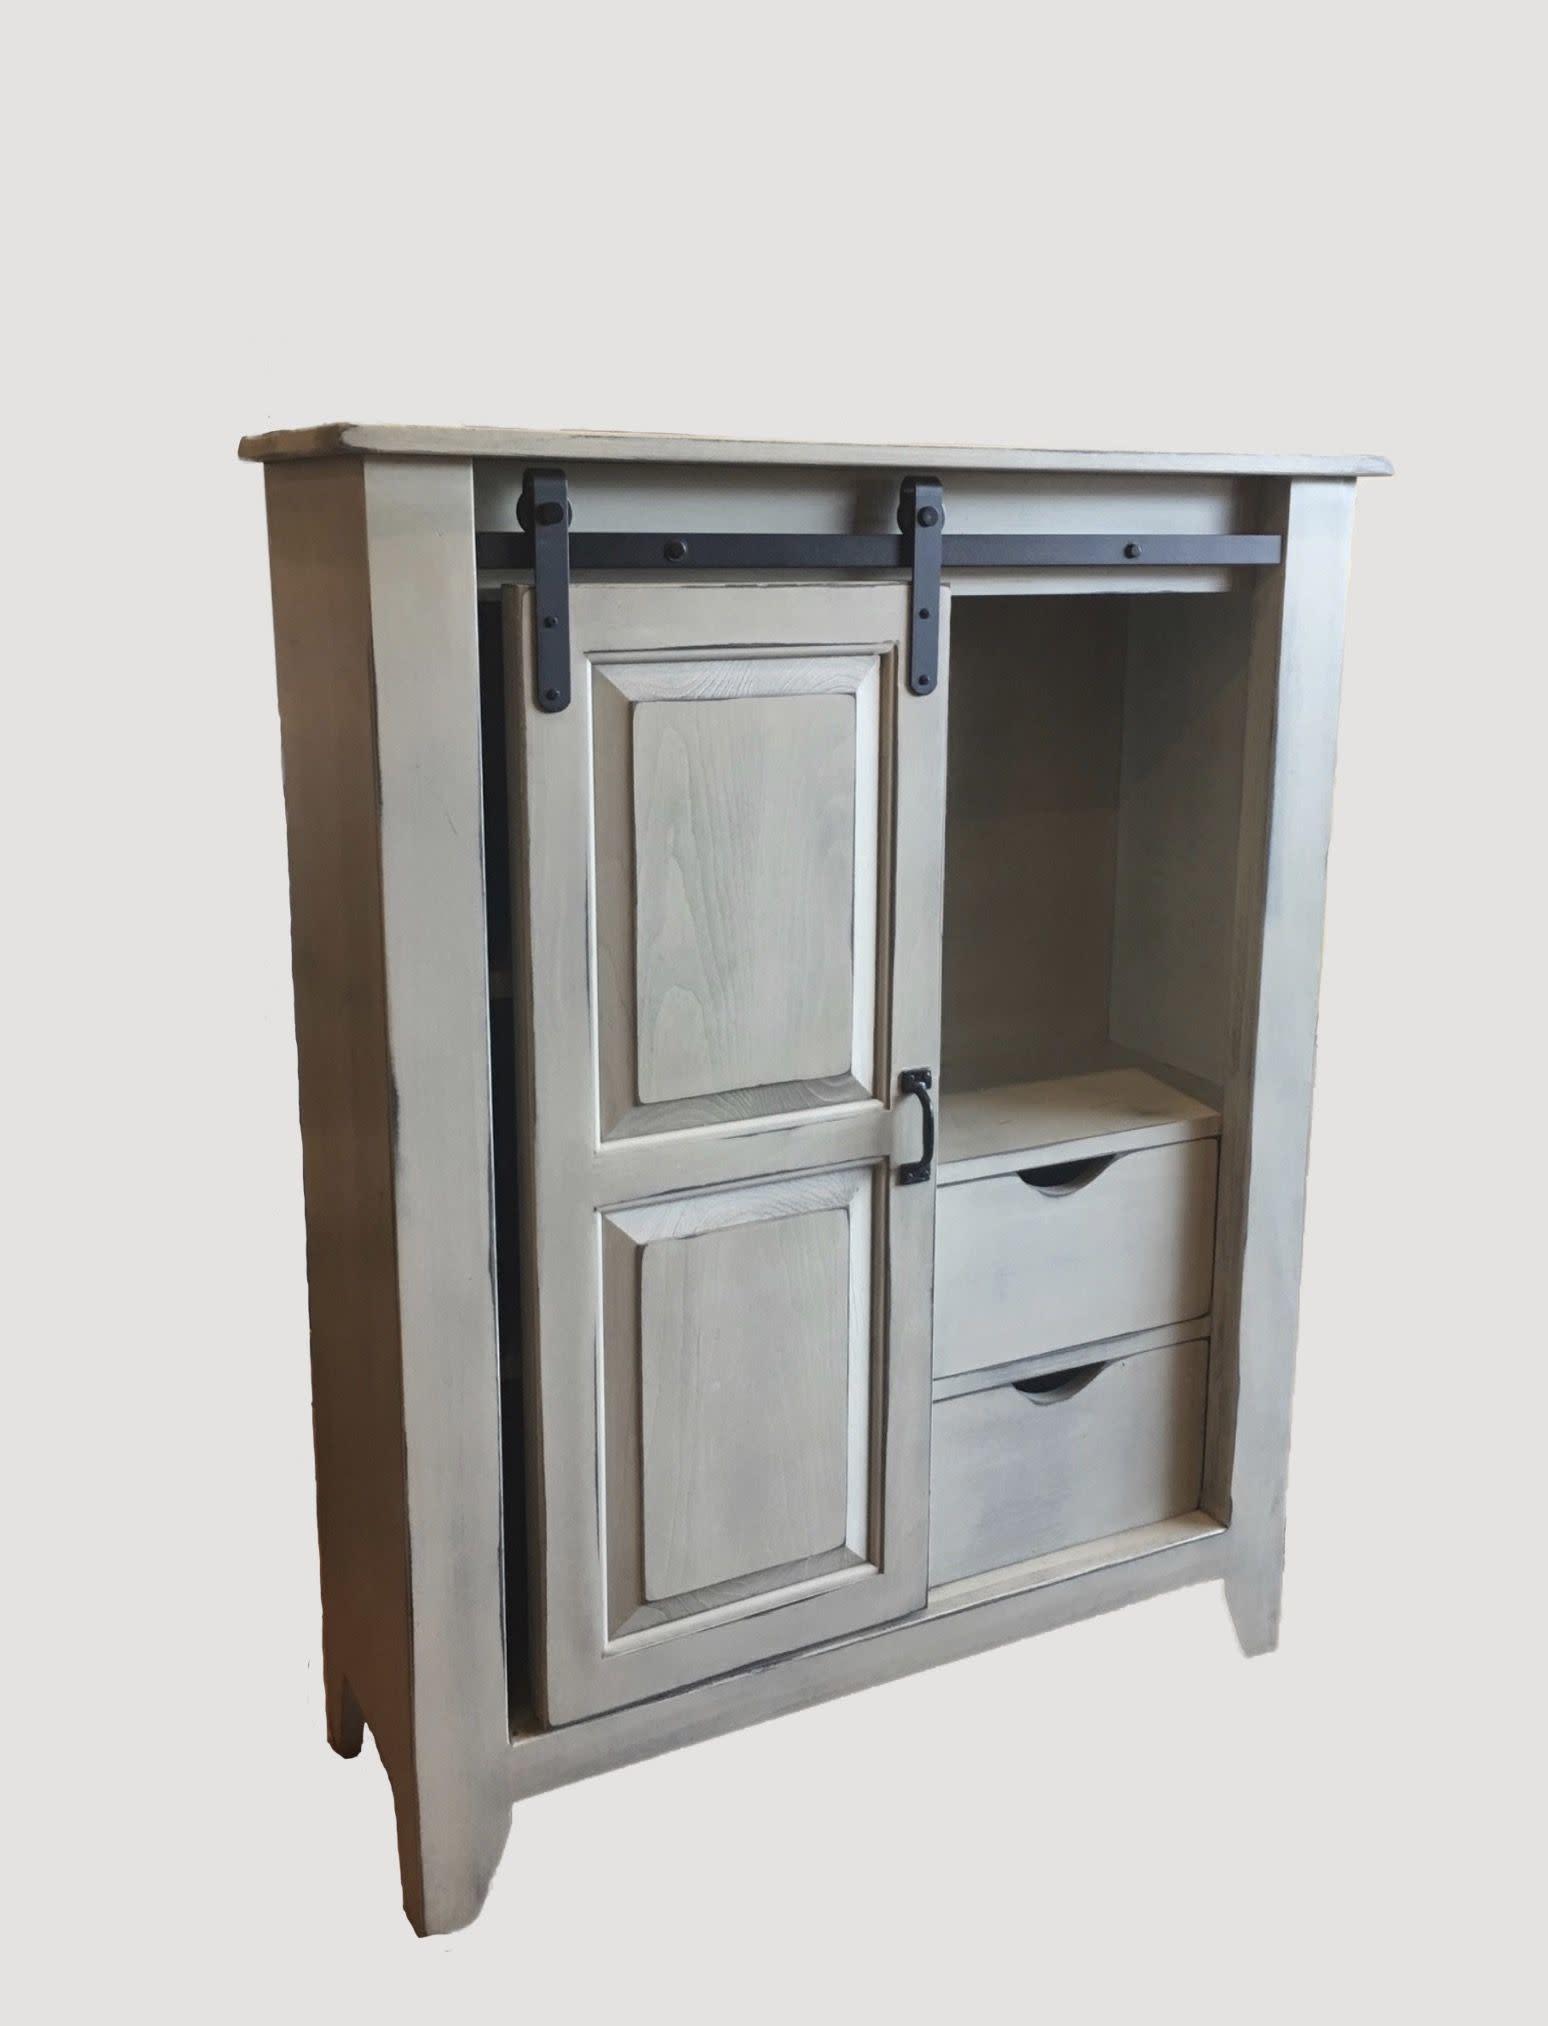 Nana's Farmhouse Buttermilk Rolling Door Cabinet